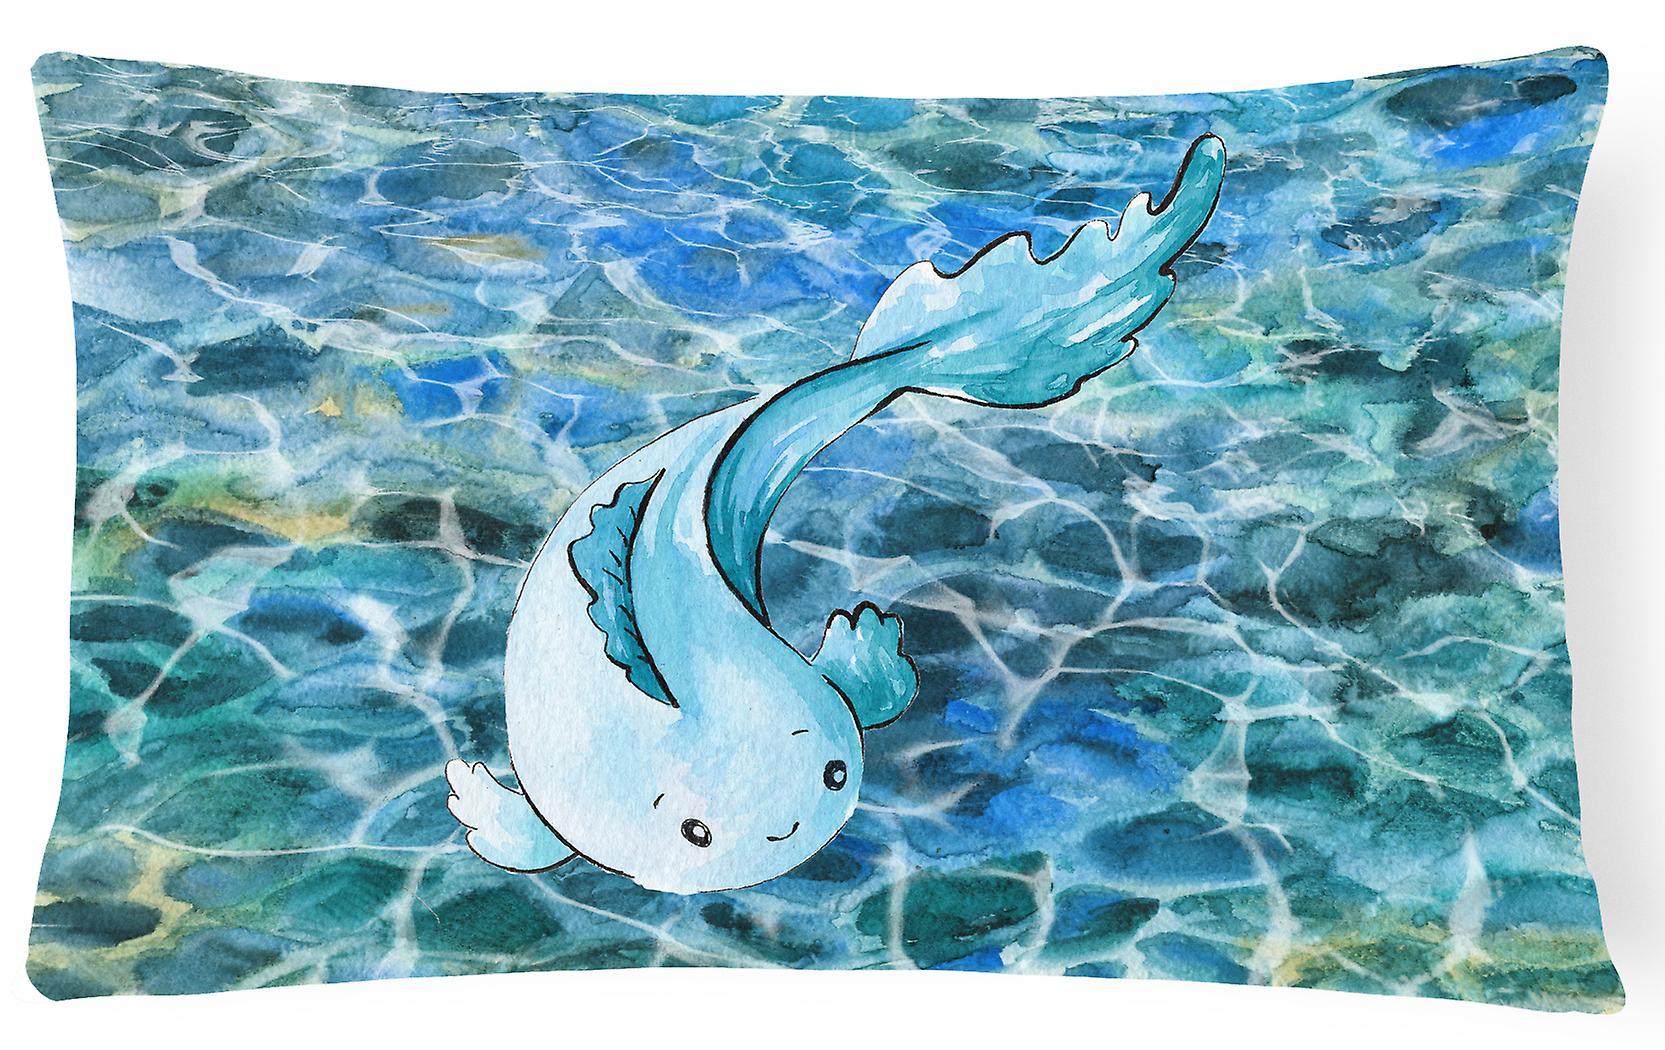 Canvas Pillow Carolines Fabric Decorative Bb8524pw1216 Blue Fish Treasures CoxerdB